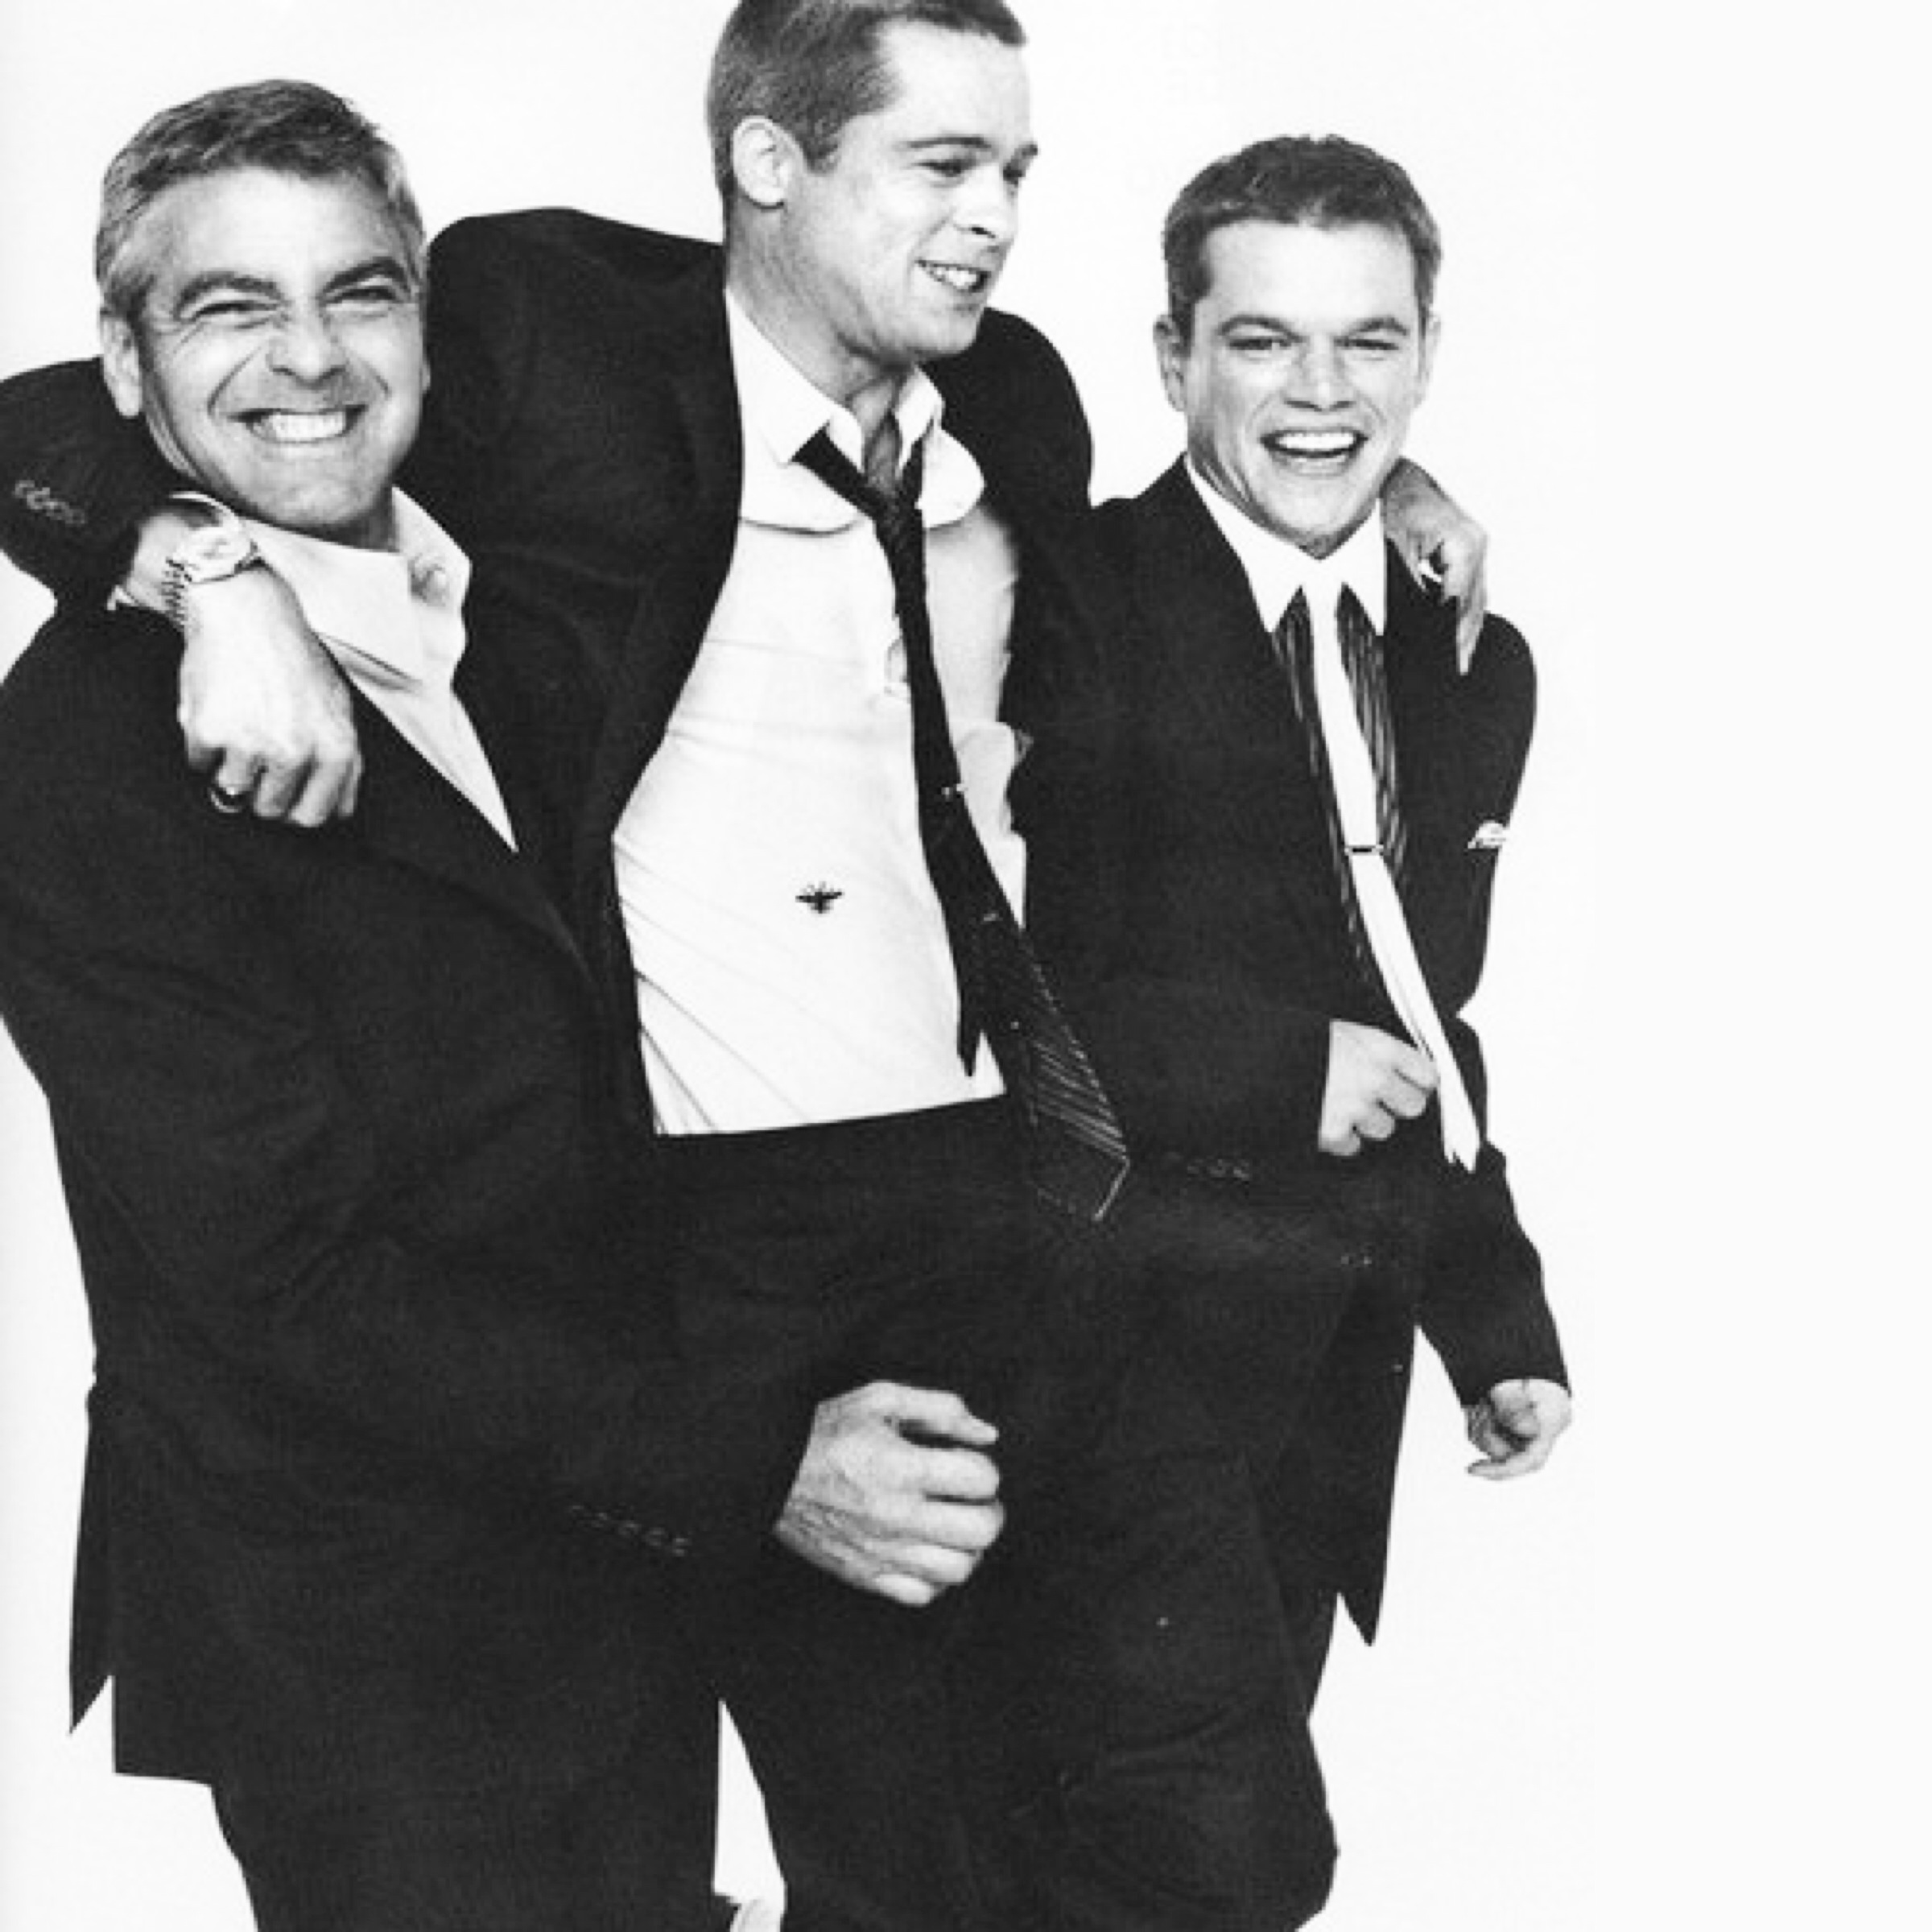 George Clooney, Brad Pitt and Matt Damon || Oceans Eleven